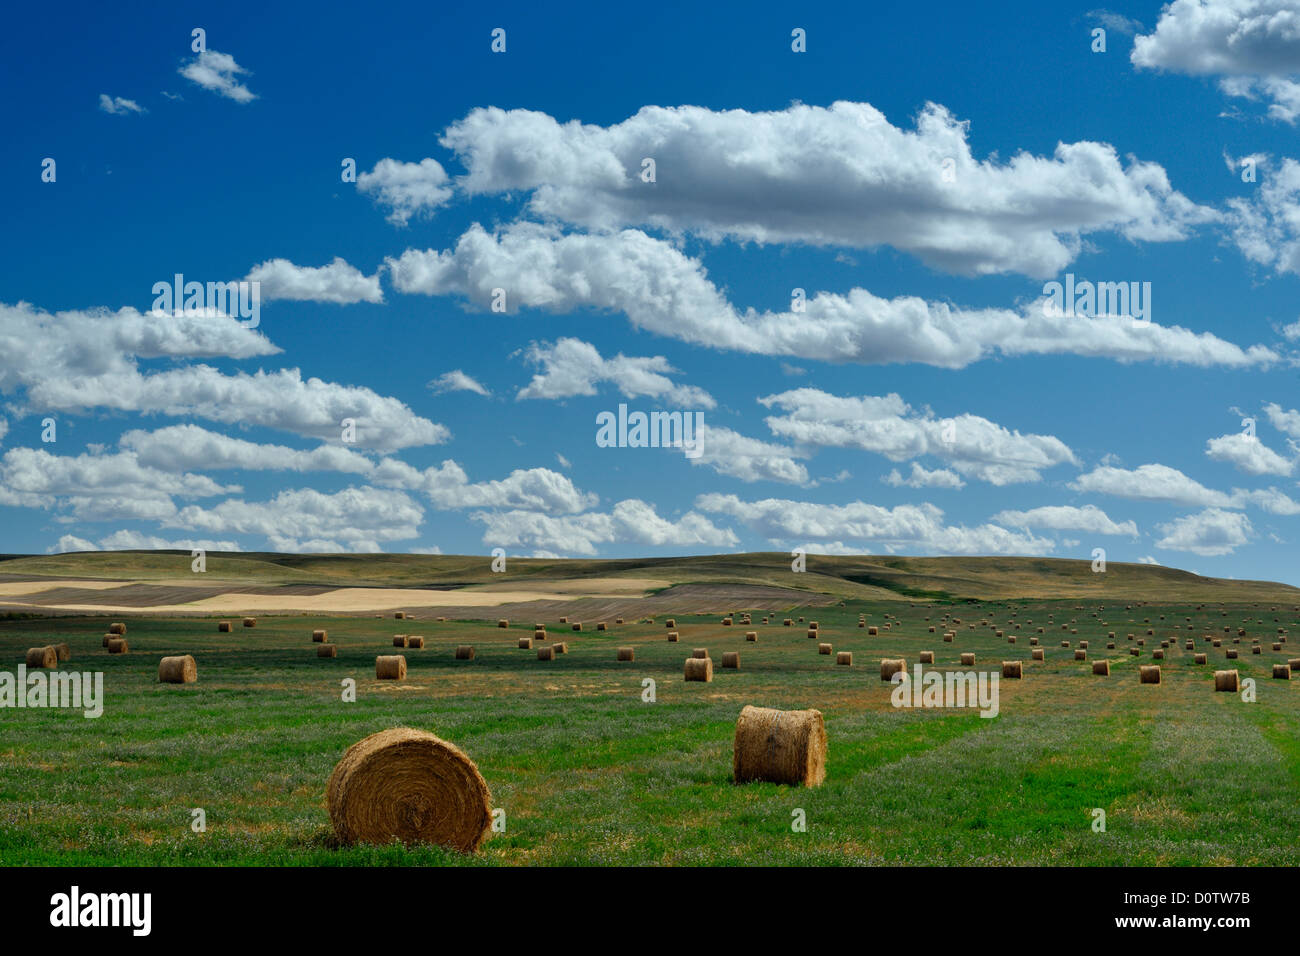 Hay rolls in the prairie, Milk River, Alberta, Canada Stock Photo